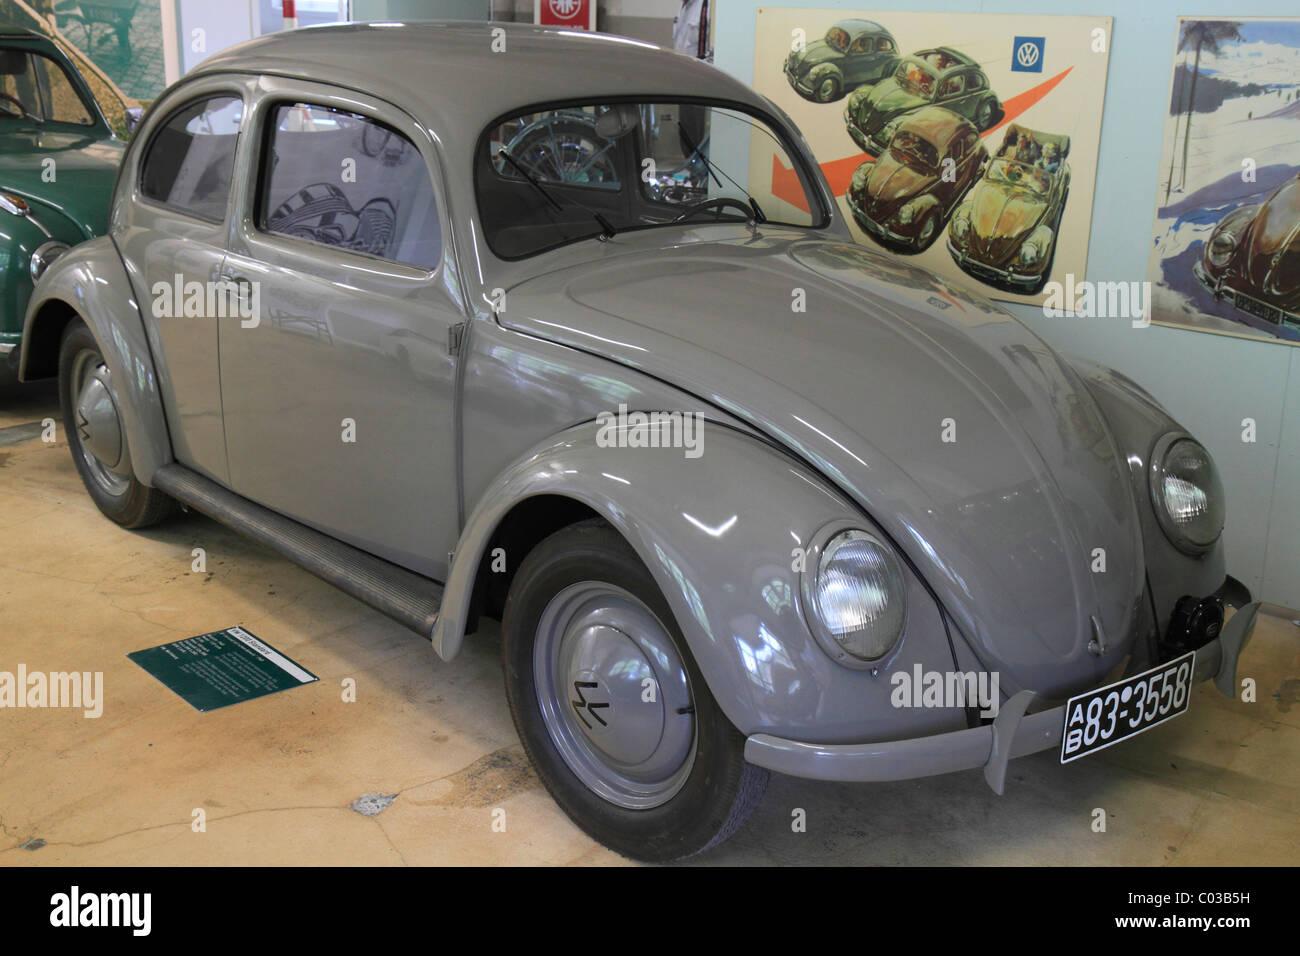 VW 1200 Standard, built in 1948, unchanged pre-war design, Volkswagen Beetle, ErfinderZeiten: Auto- und Uhrenmuseum, - Stock Image